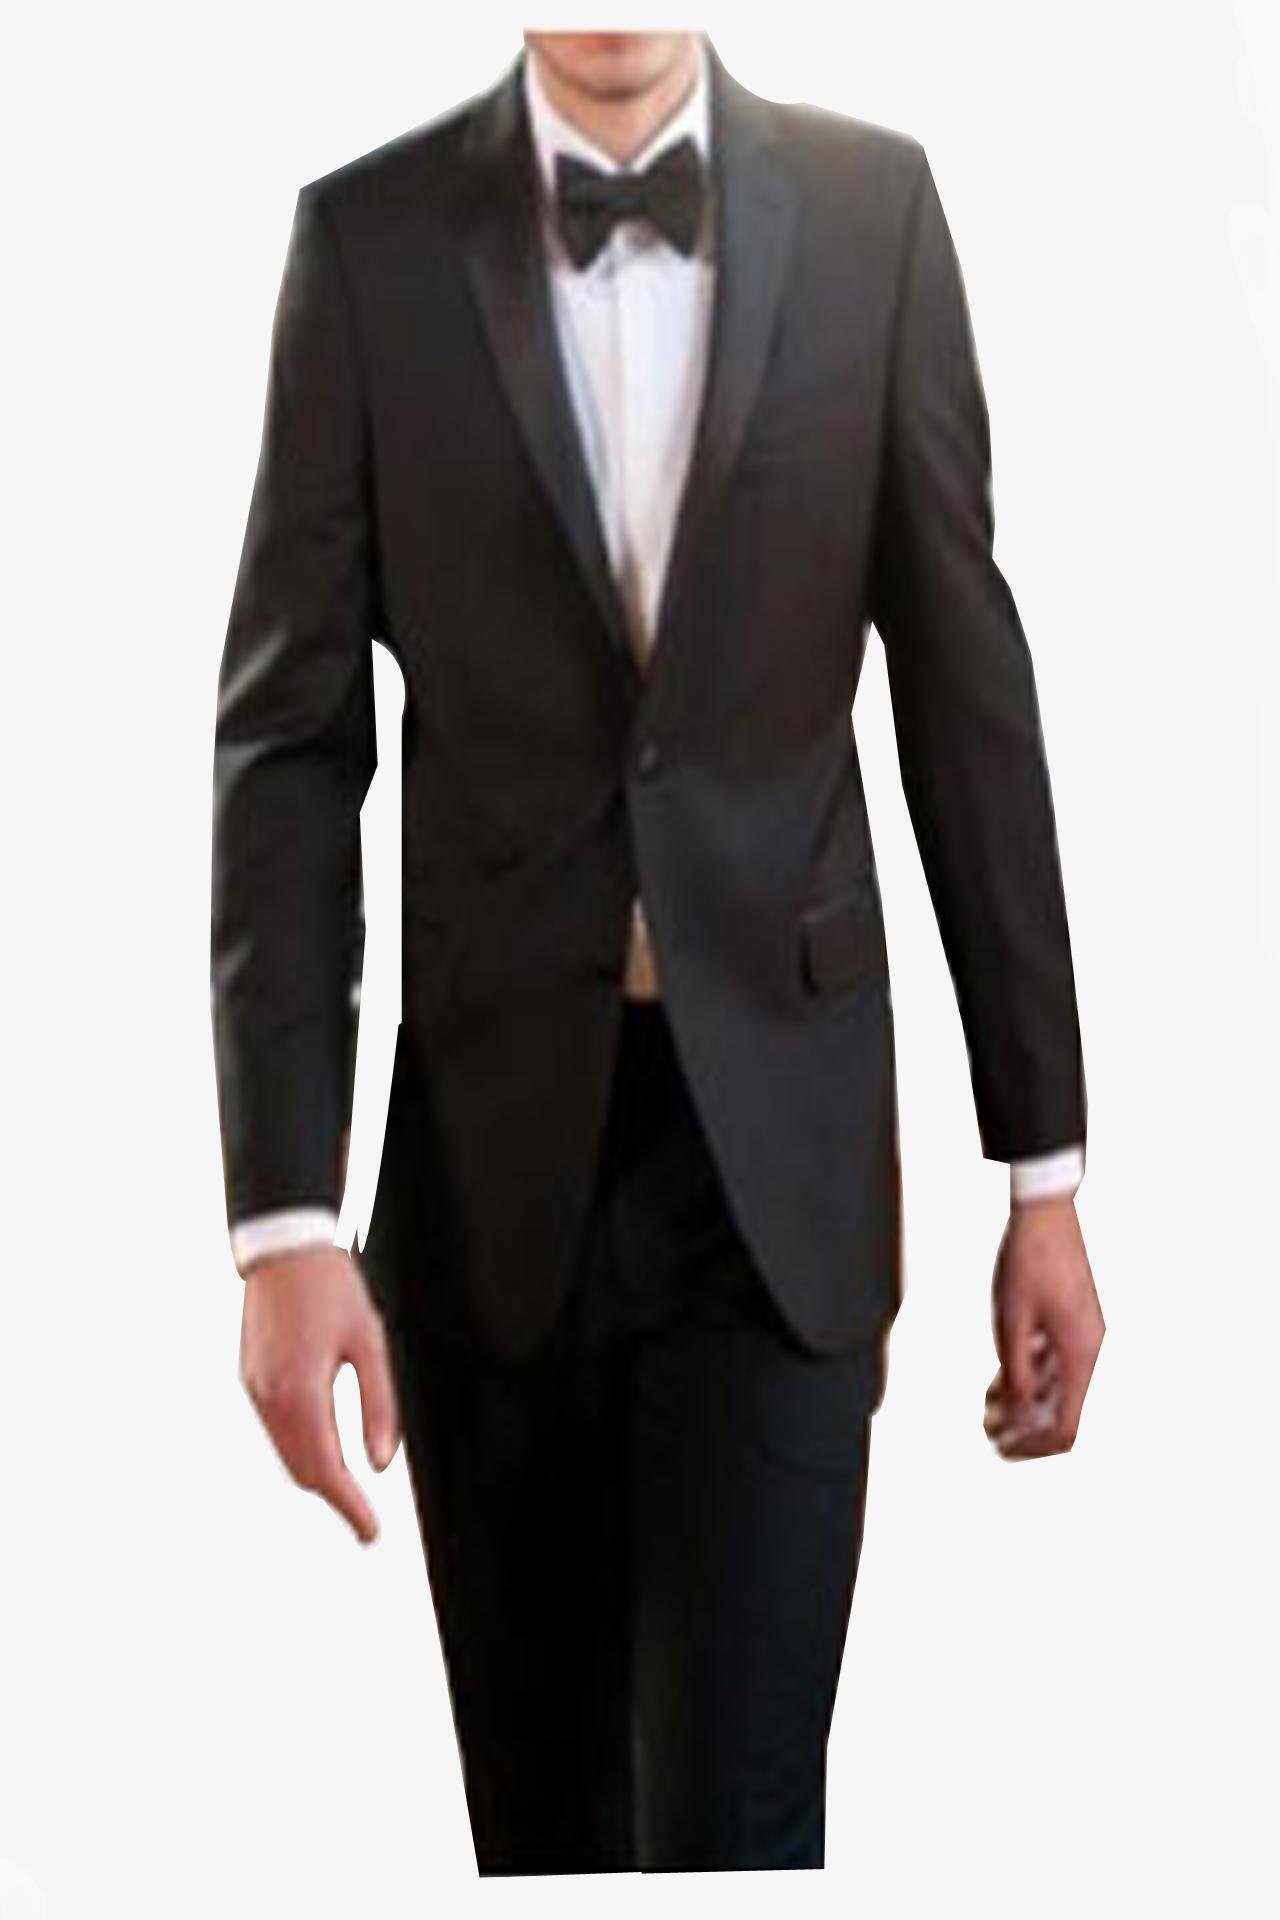 Tuxedo Dark Black